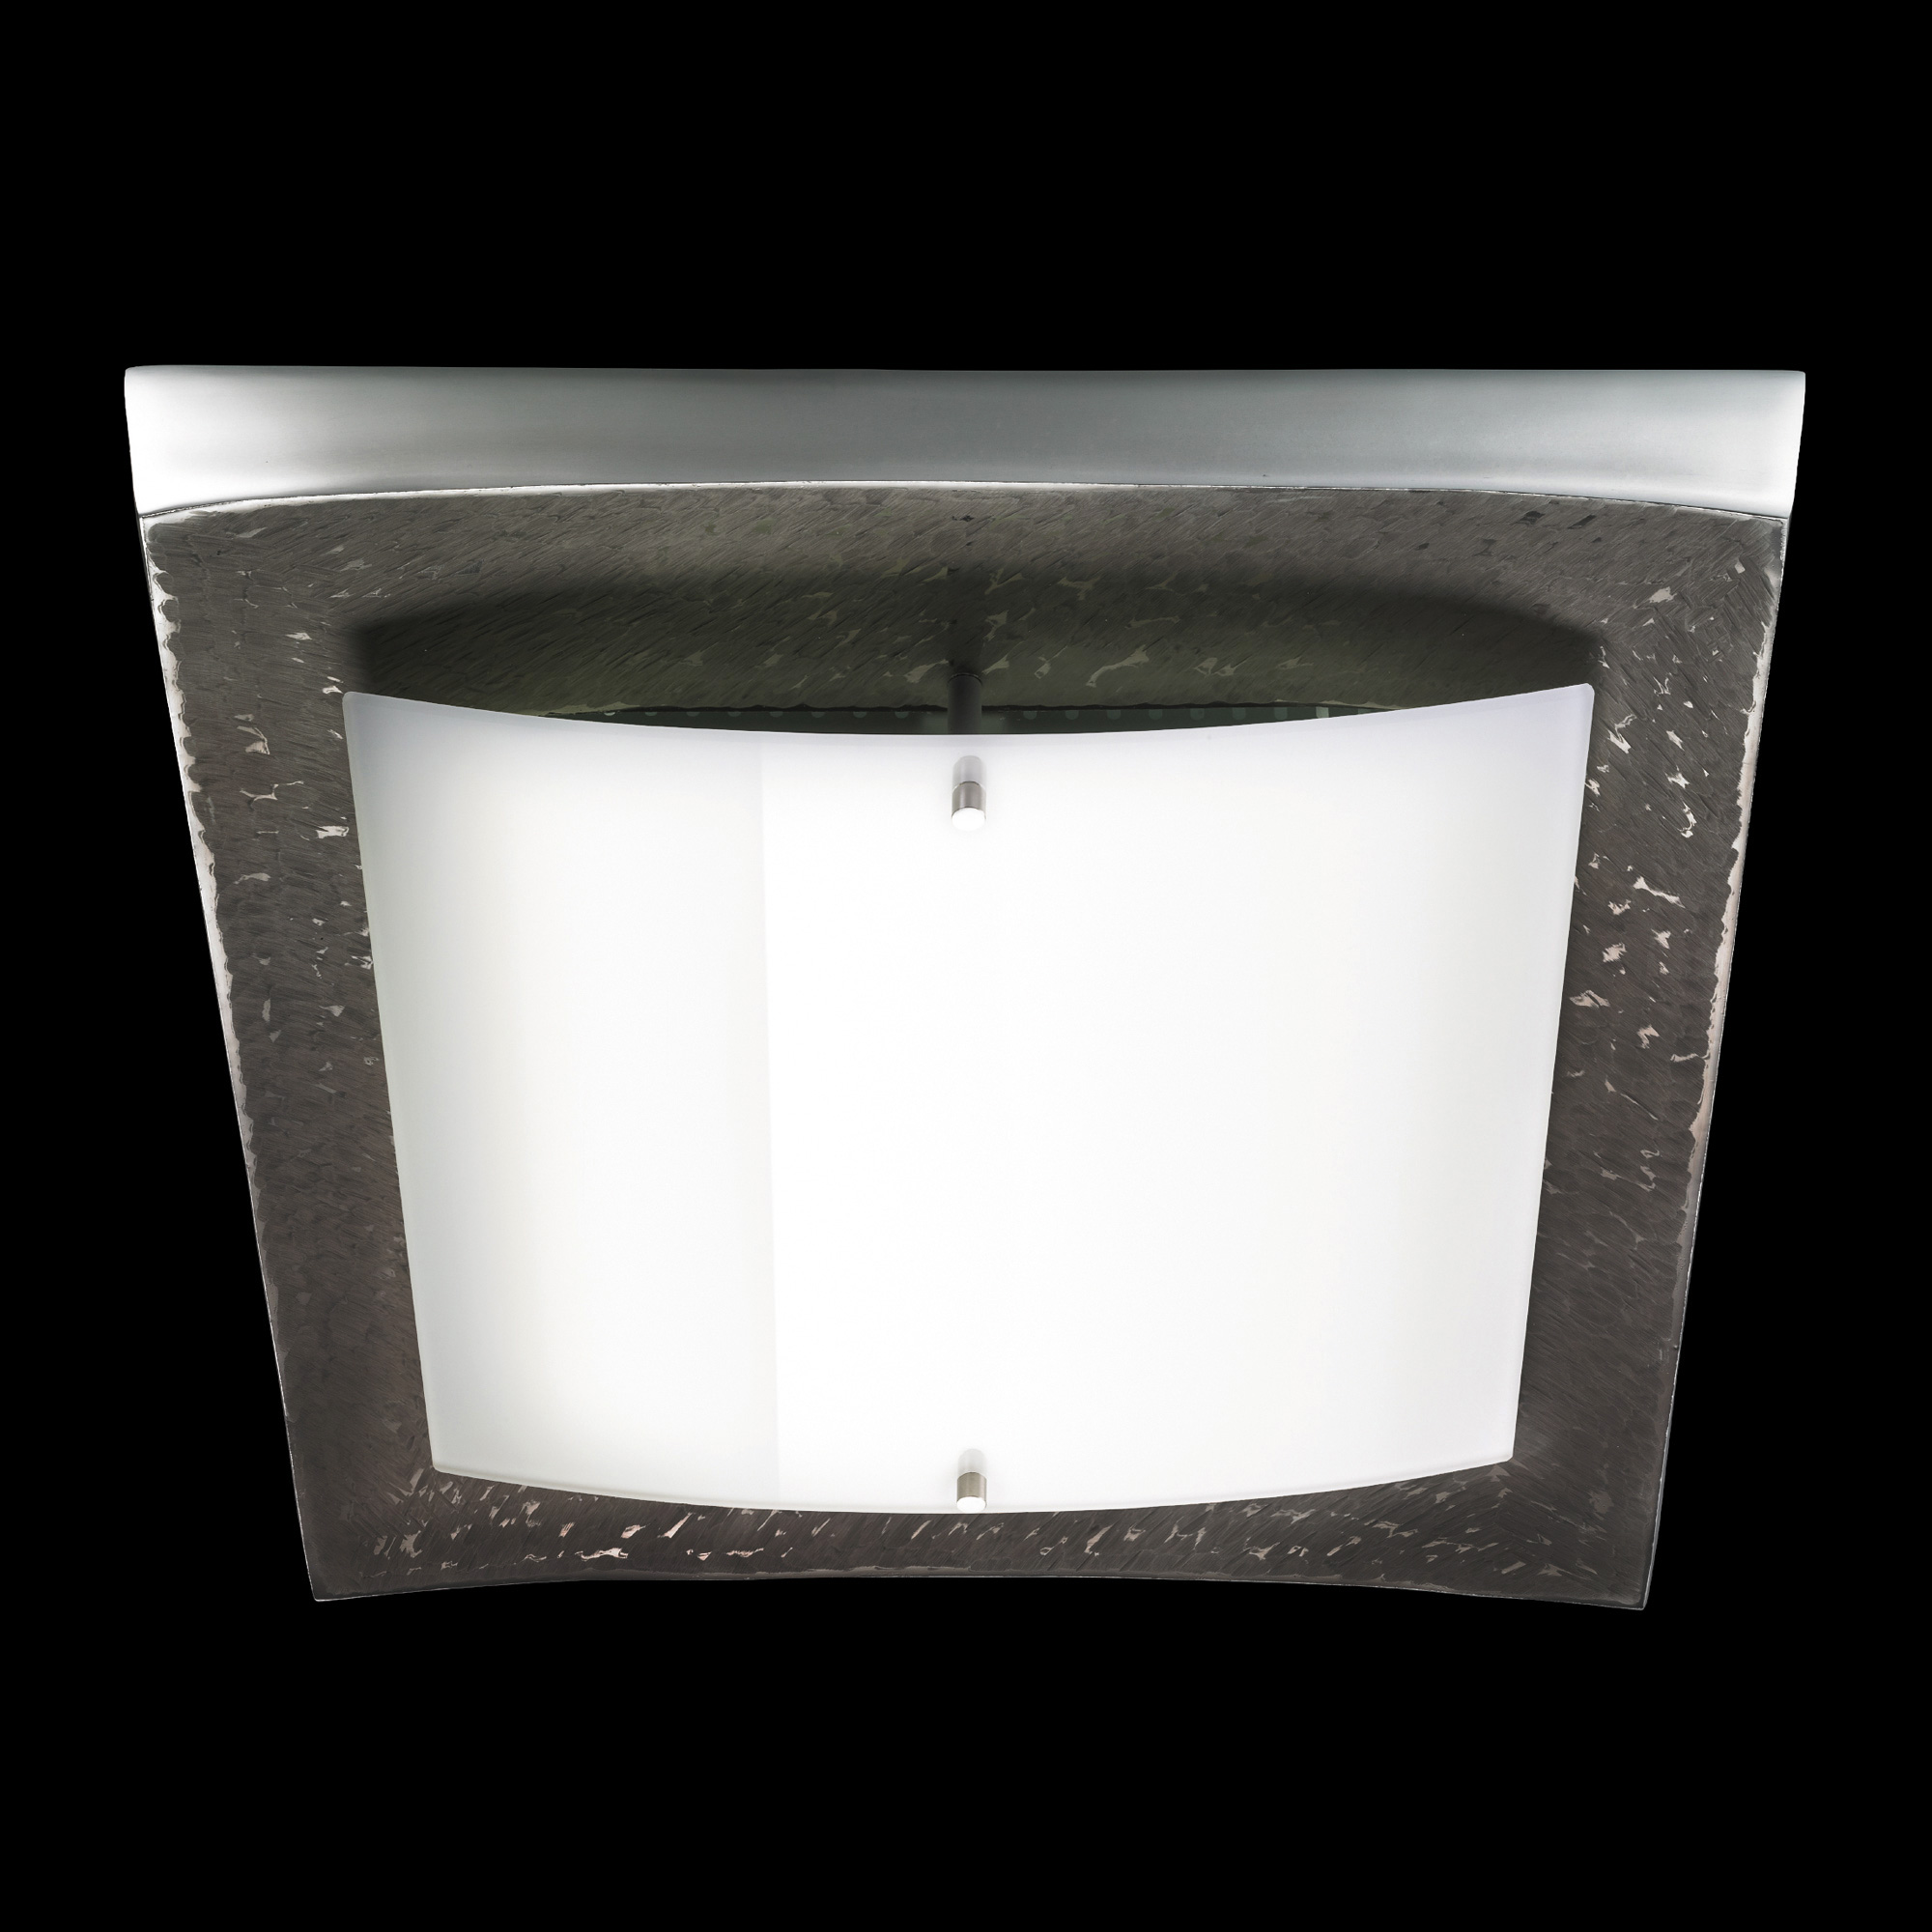 shine by fischer 51500 led deckenleuchte 51581 reuter onlineshop. Black Bedroom Furniture Sets. Home Design Ideas